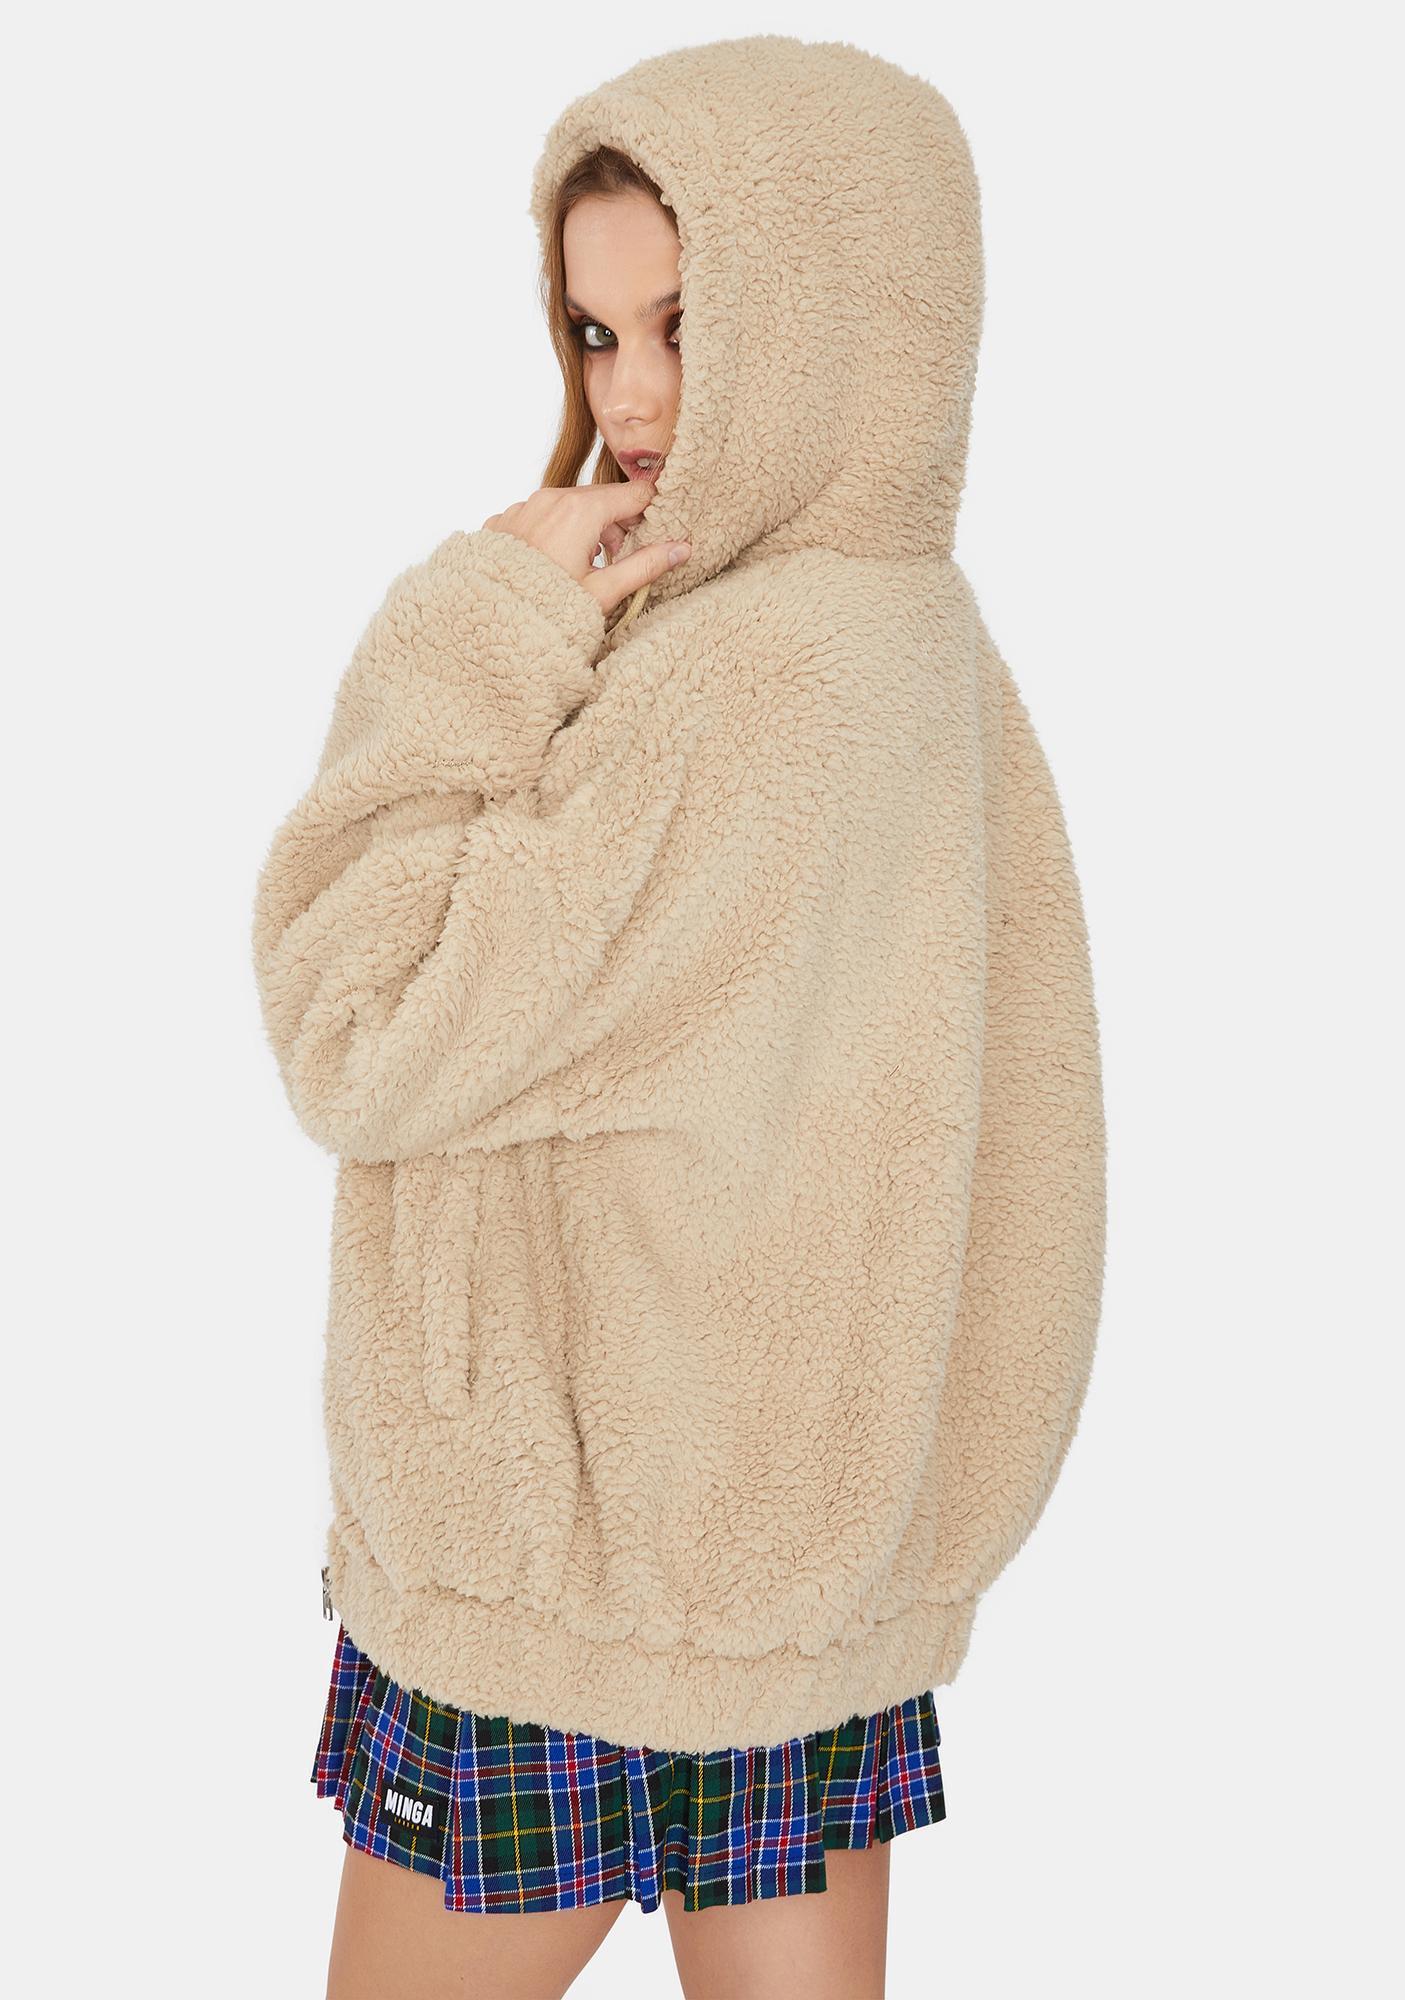 Daisy Street Tan Hooded Sherpa Jacket